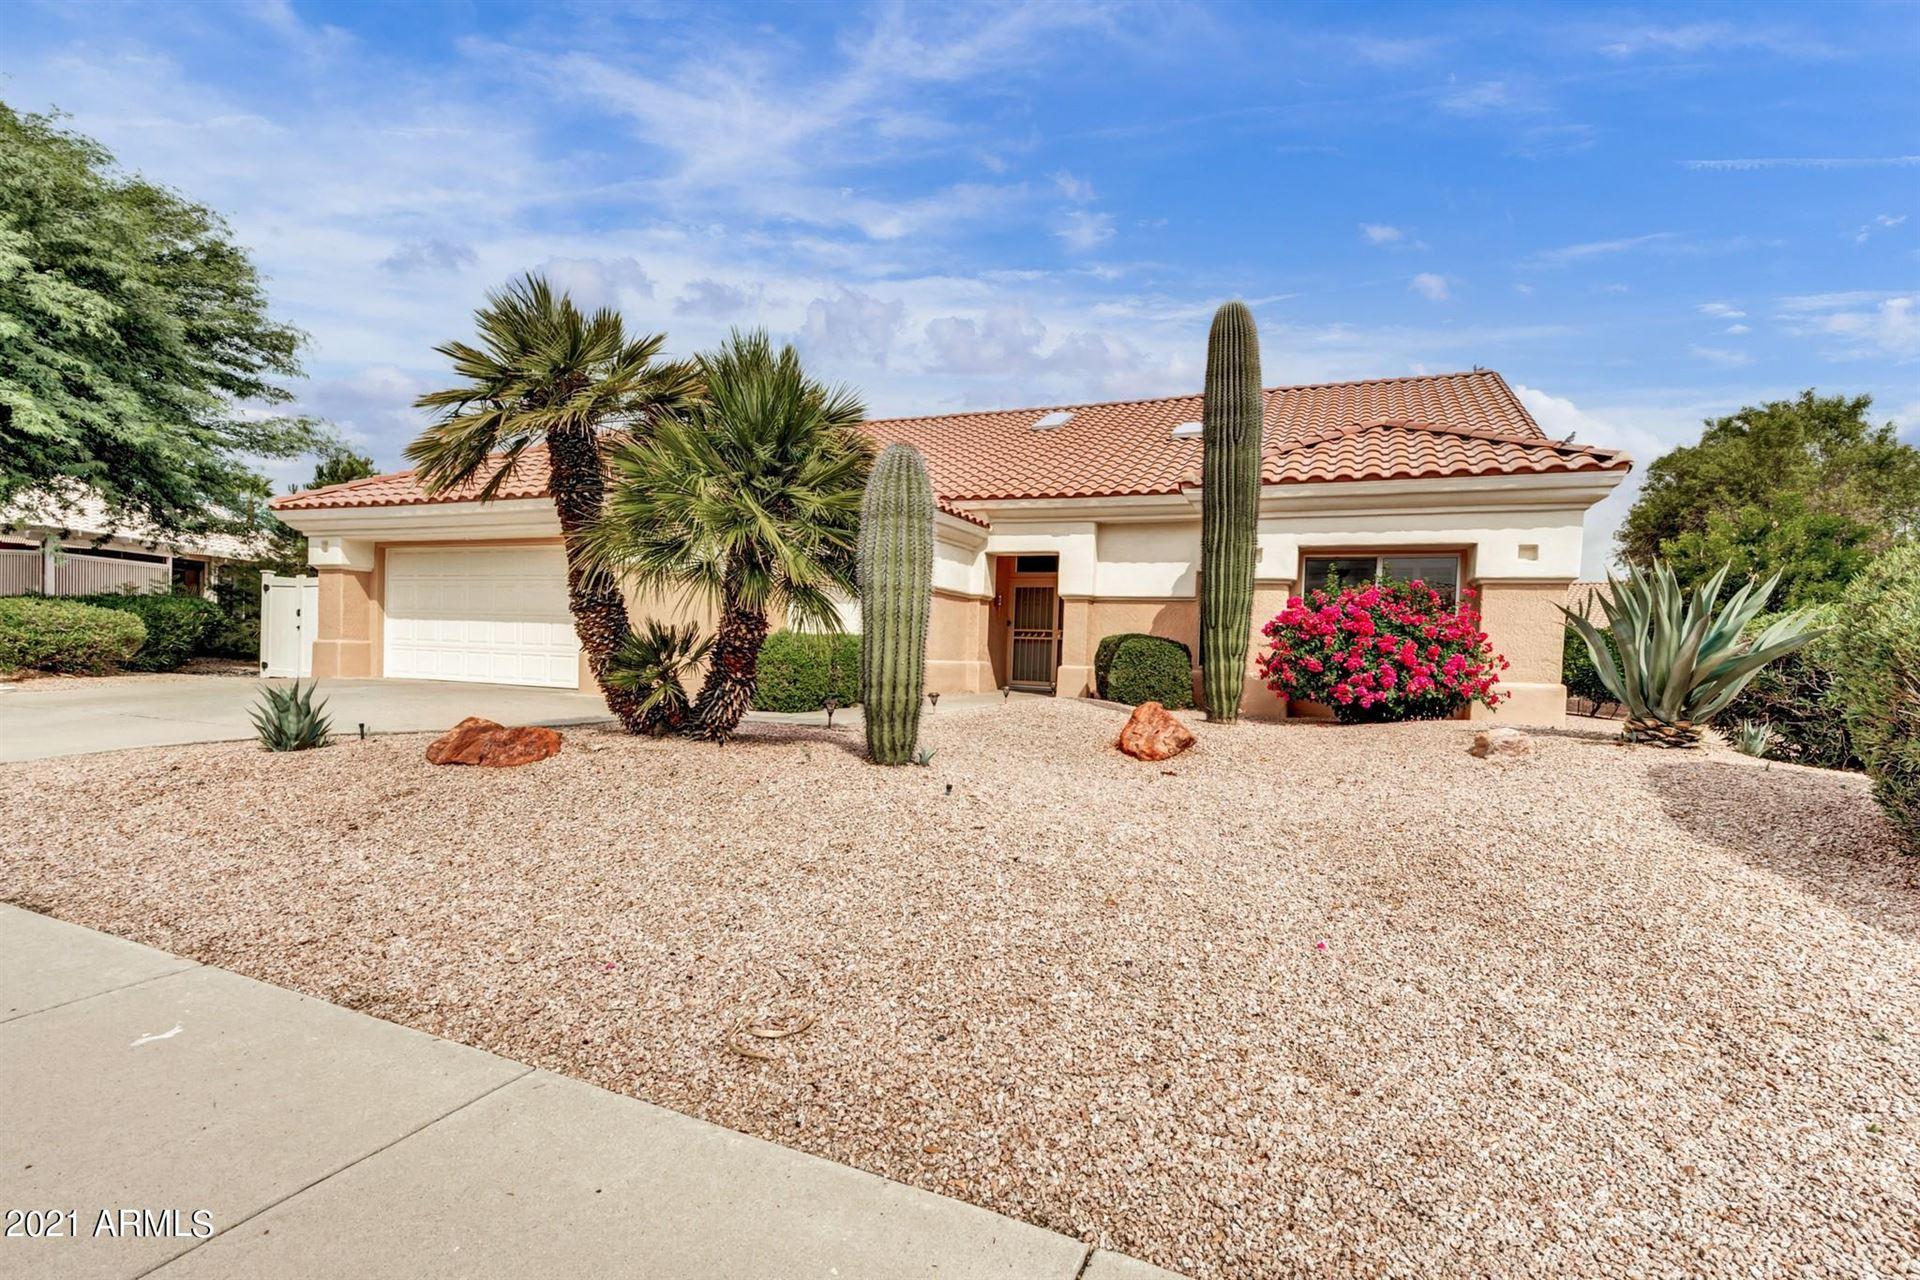 Photo of 22610 N VIA TERCERO --, Sun City West, AZ 85375 (MLS # 6266107)